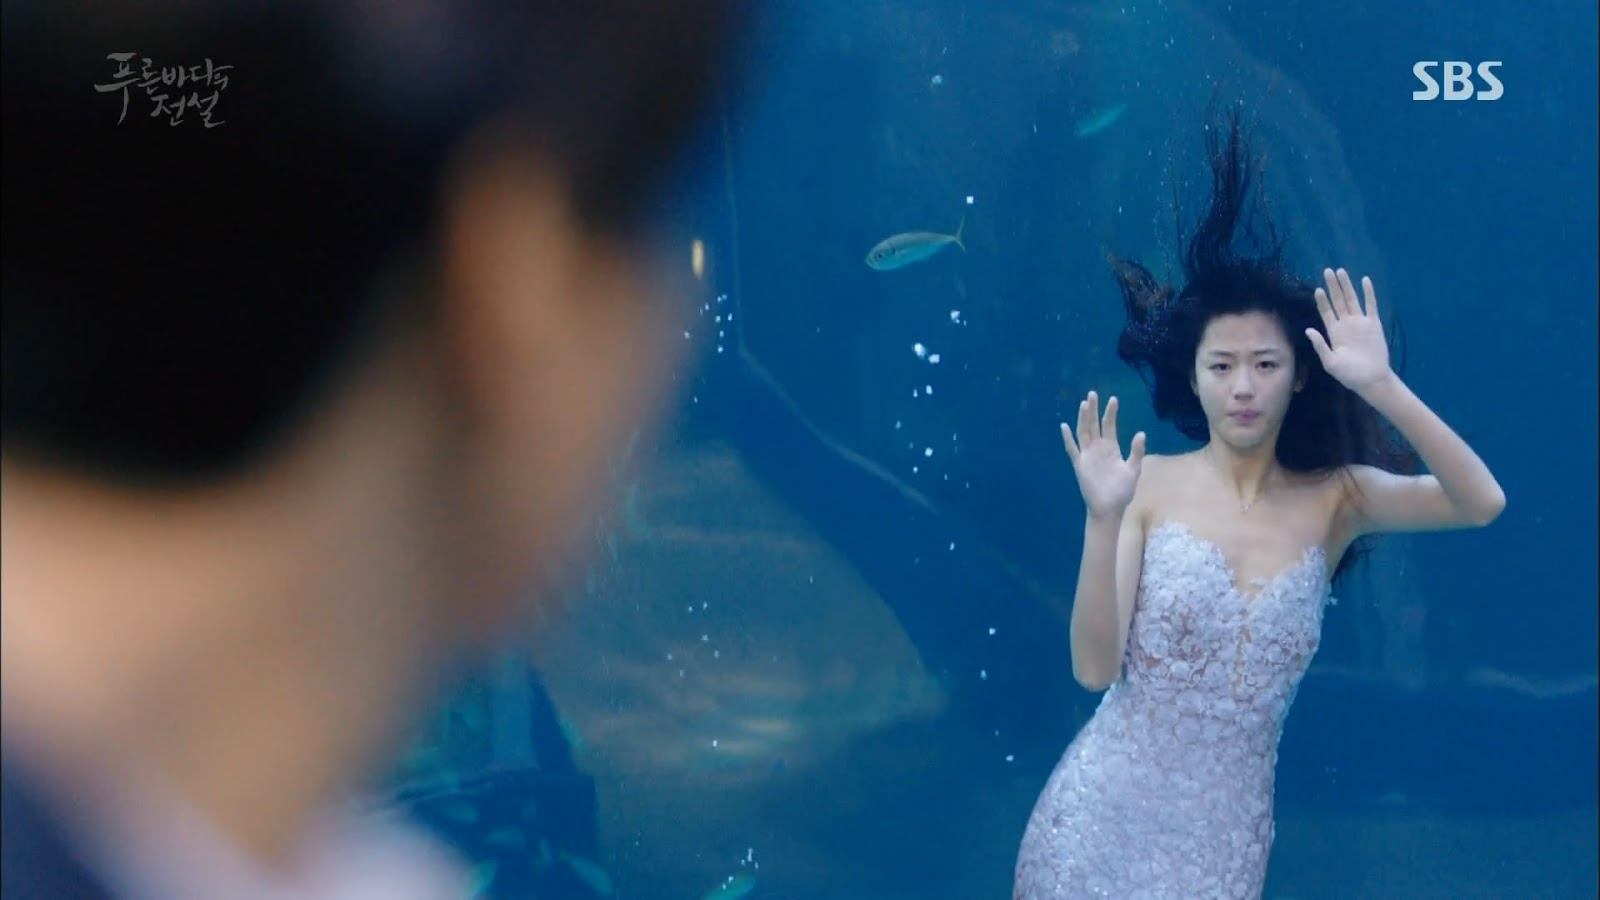 Screenshot Joon Jea And Cheong Yi Finally Meet The Legend Of The Blu Sea (2016)  1080p Episode 03 - www.uchiha-uzuma.com